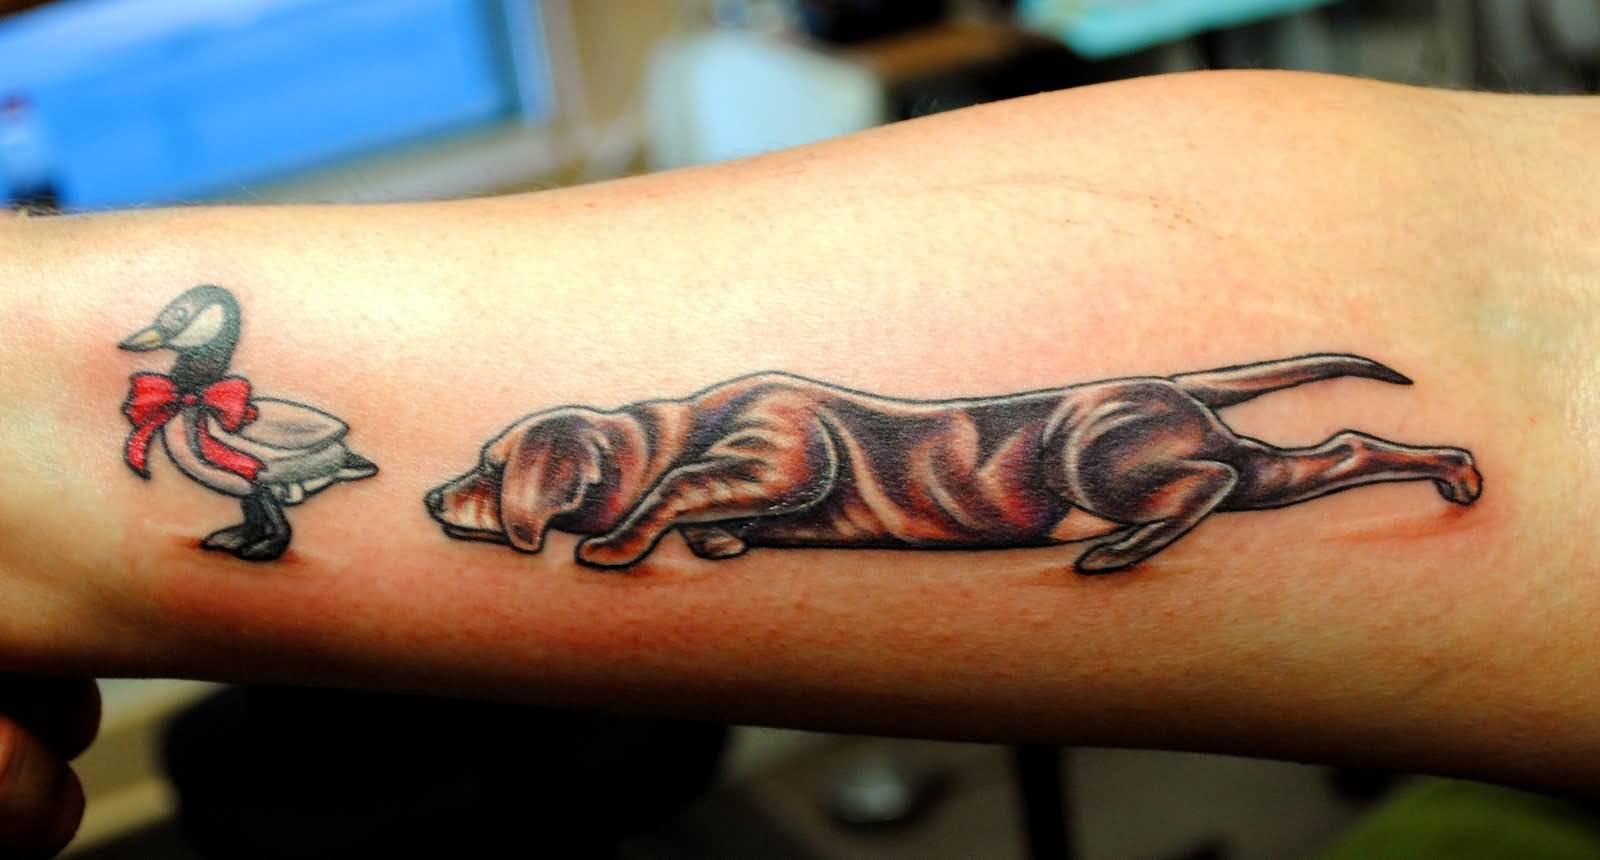 dog hunting duck tattoo on forearm. Black Bedroom Furniture Sets. Home Design Ideas